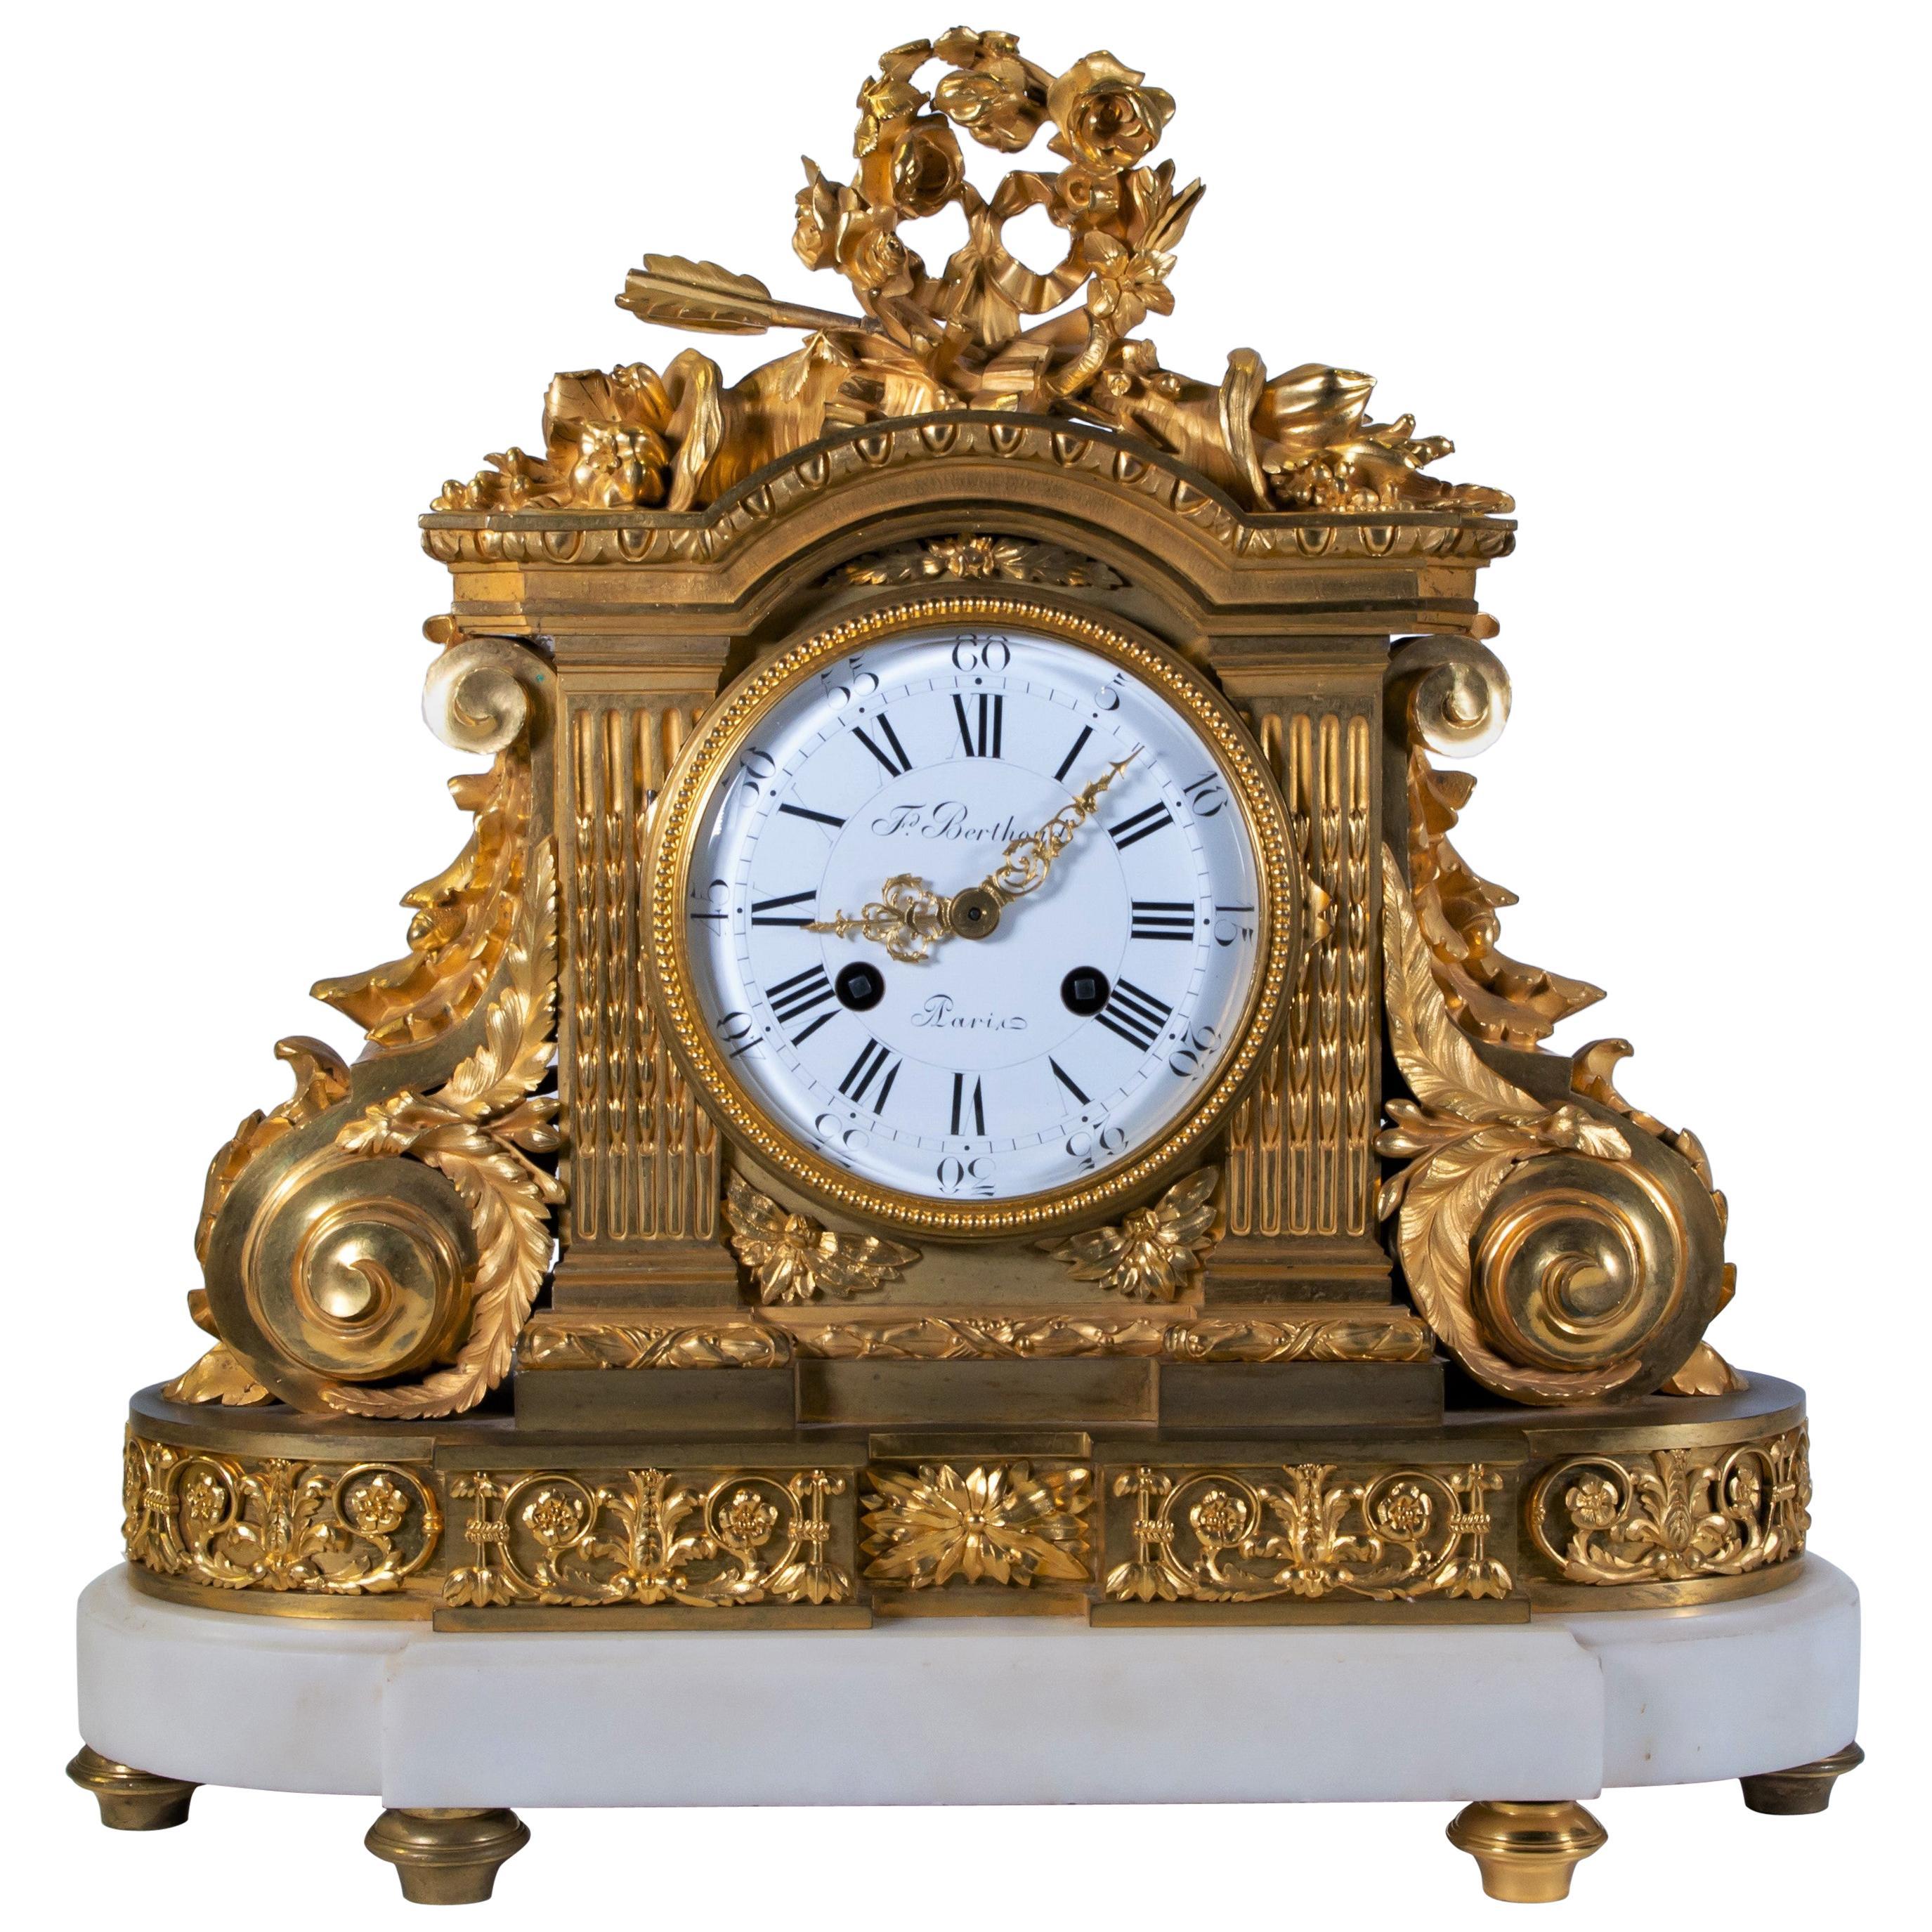 18th Century Carrara Marble and Dore Bronze Mantle Clock, F. Berthoud